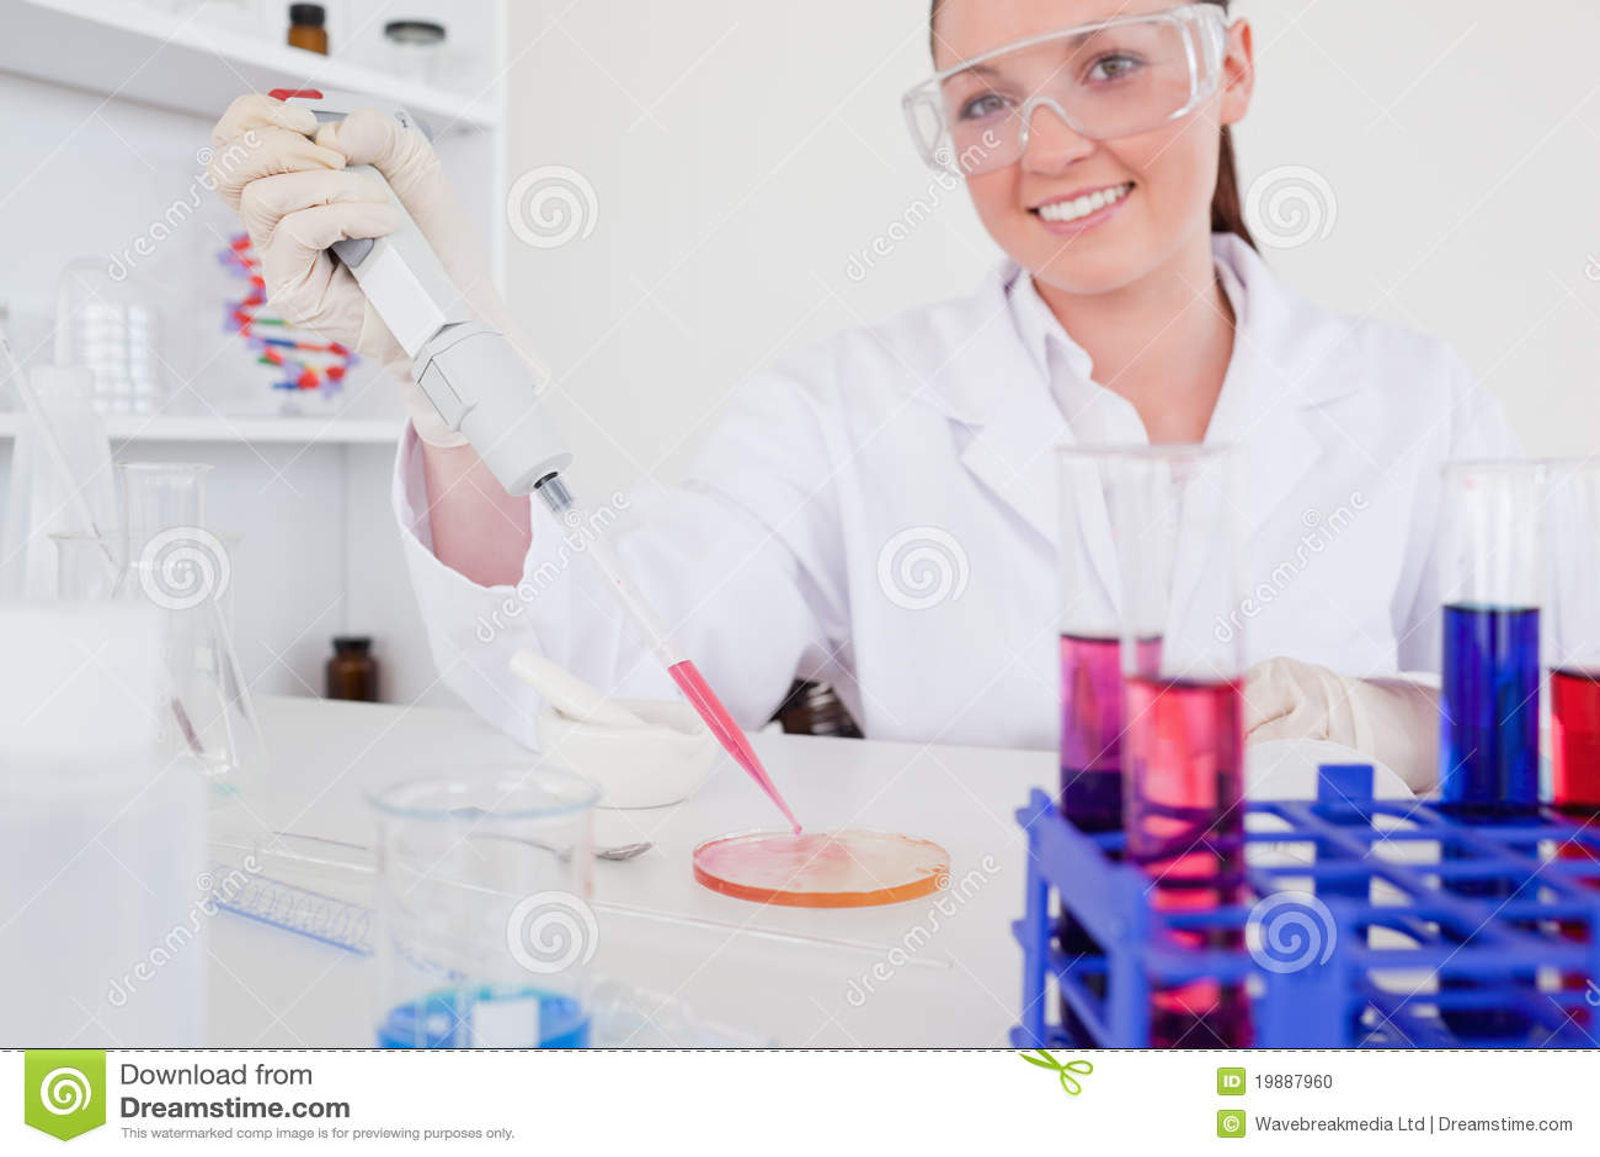 Шикарный red-haired научный работник используя пипетку